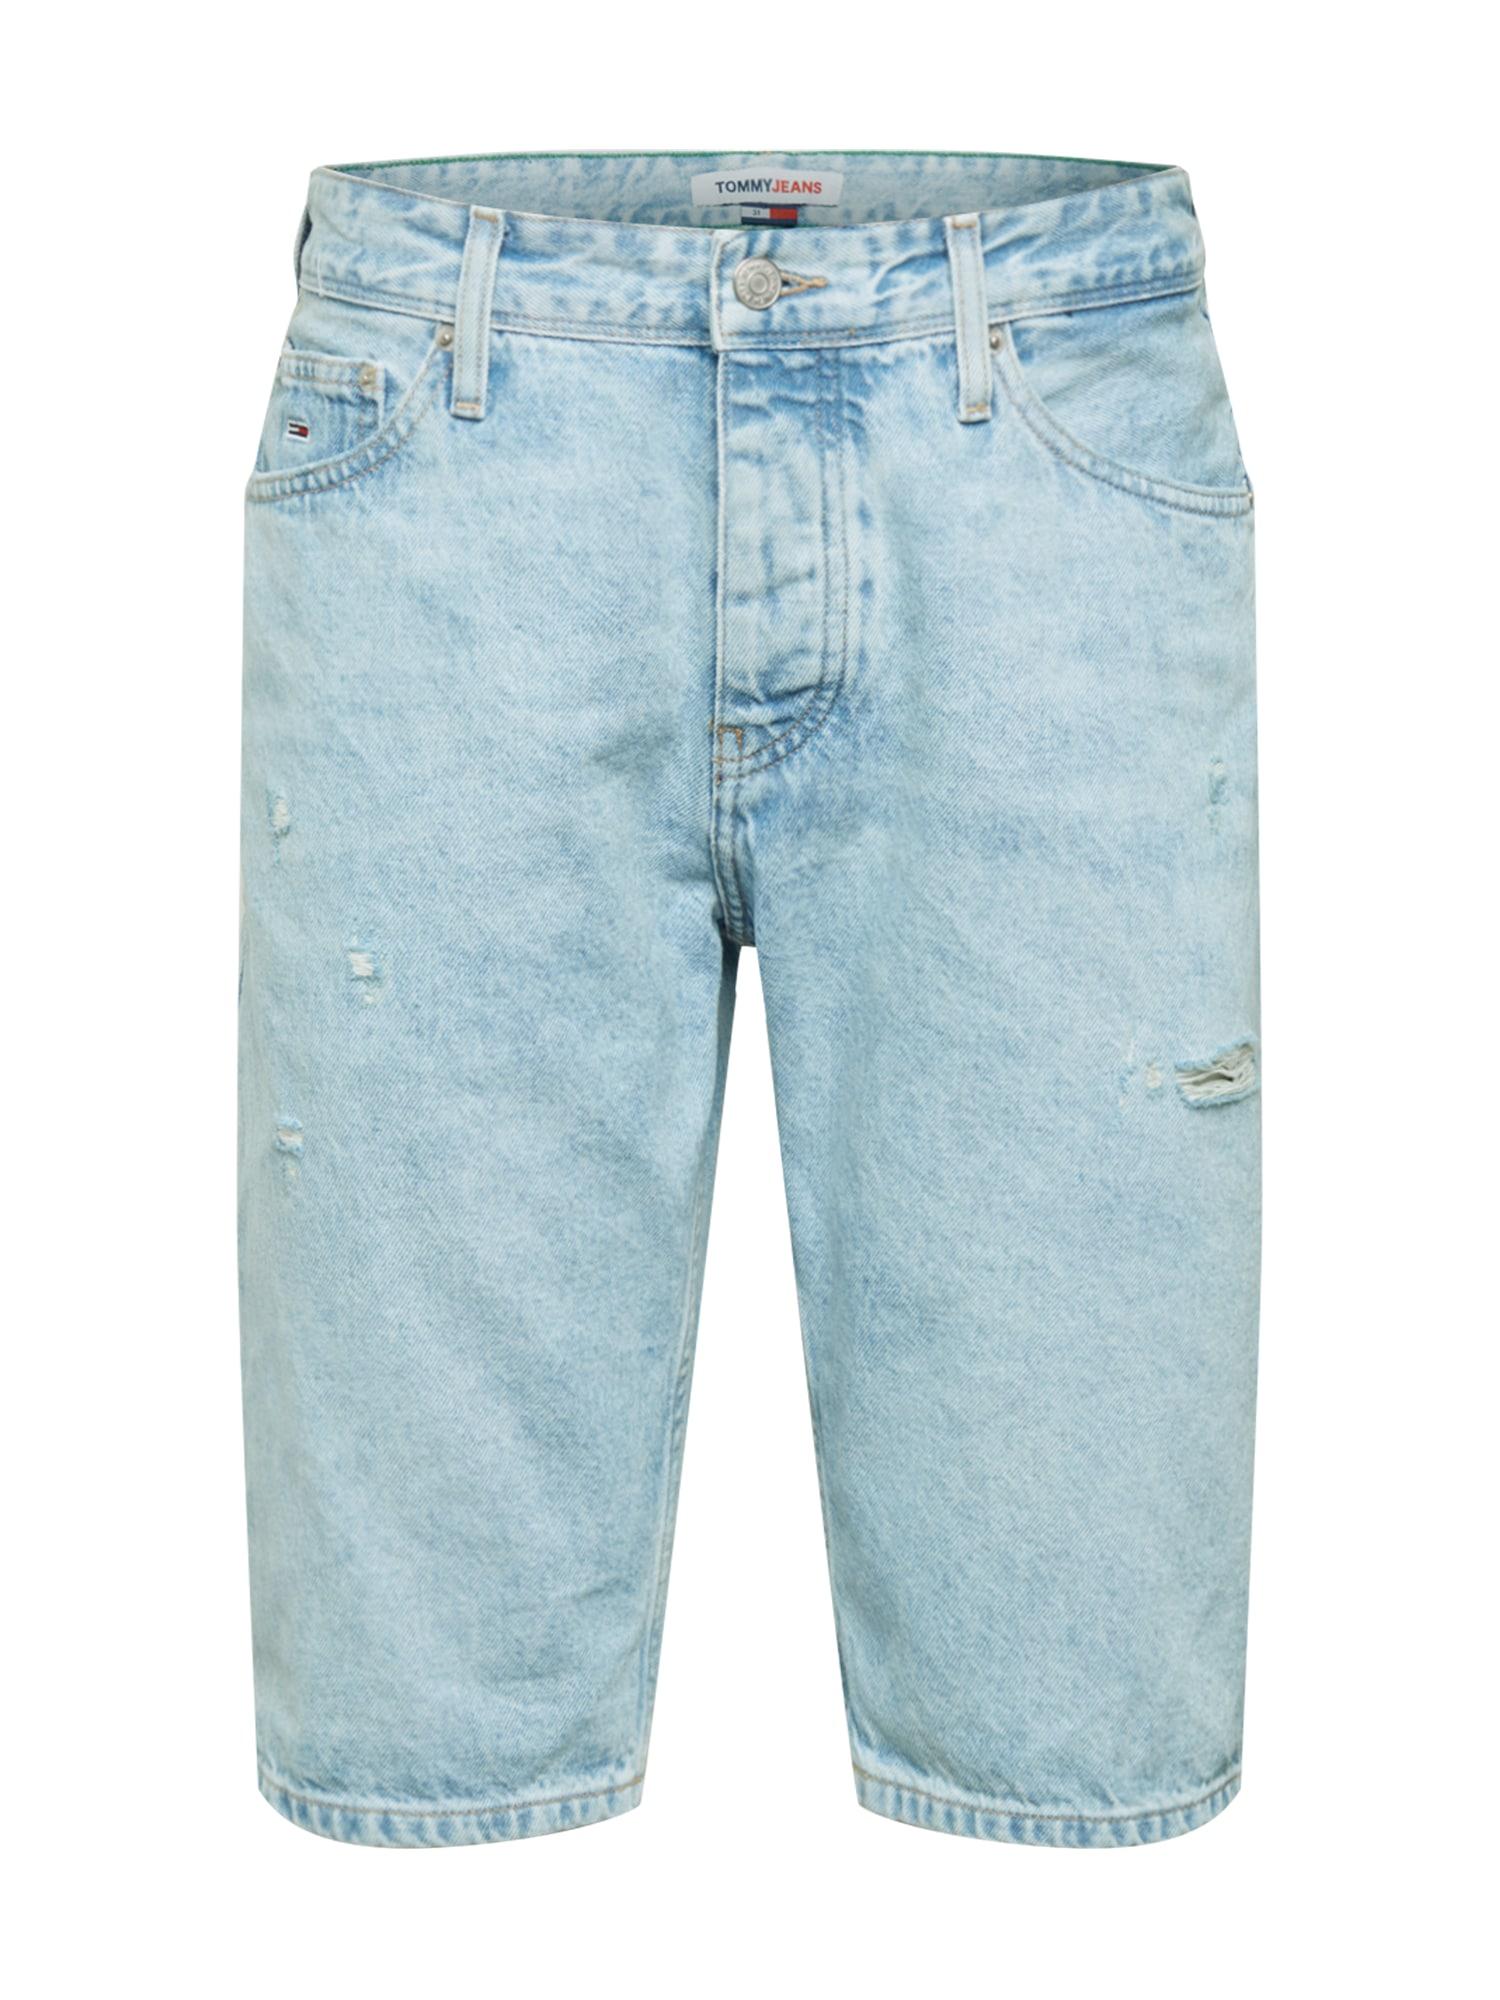 Tommy Jeans Džinsai 'ETHAN' tamsiai (džinso) mėlyna